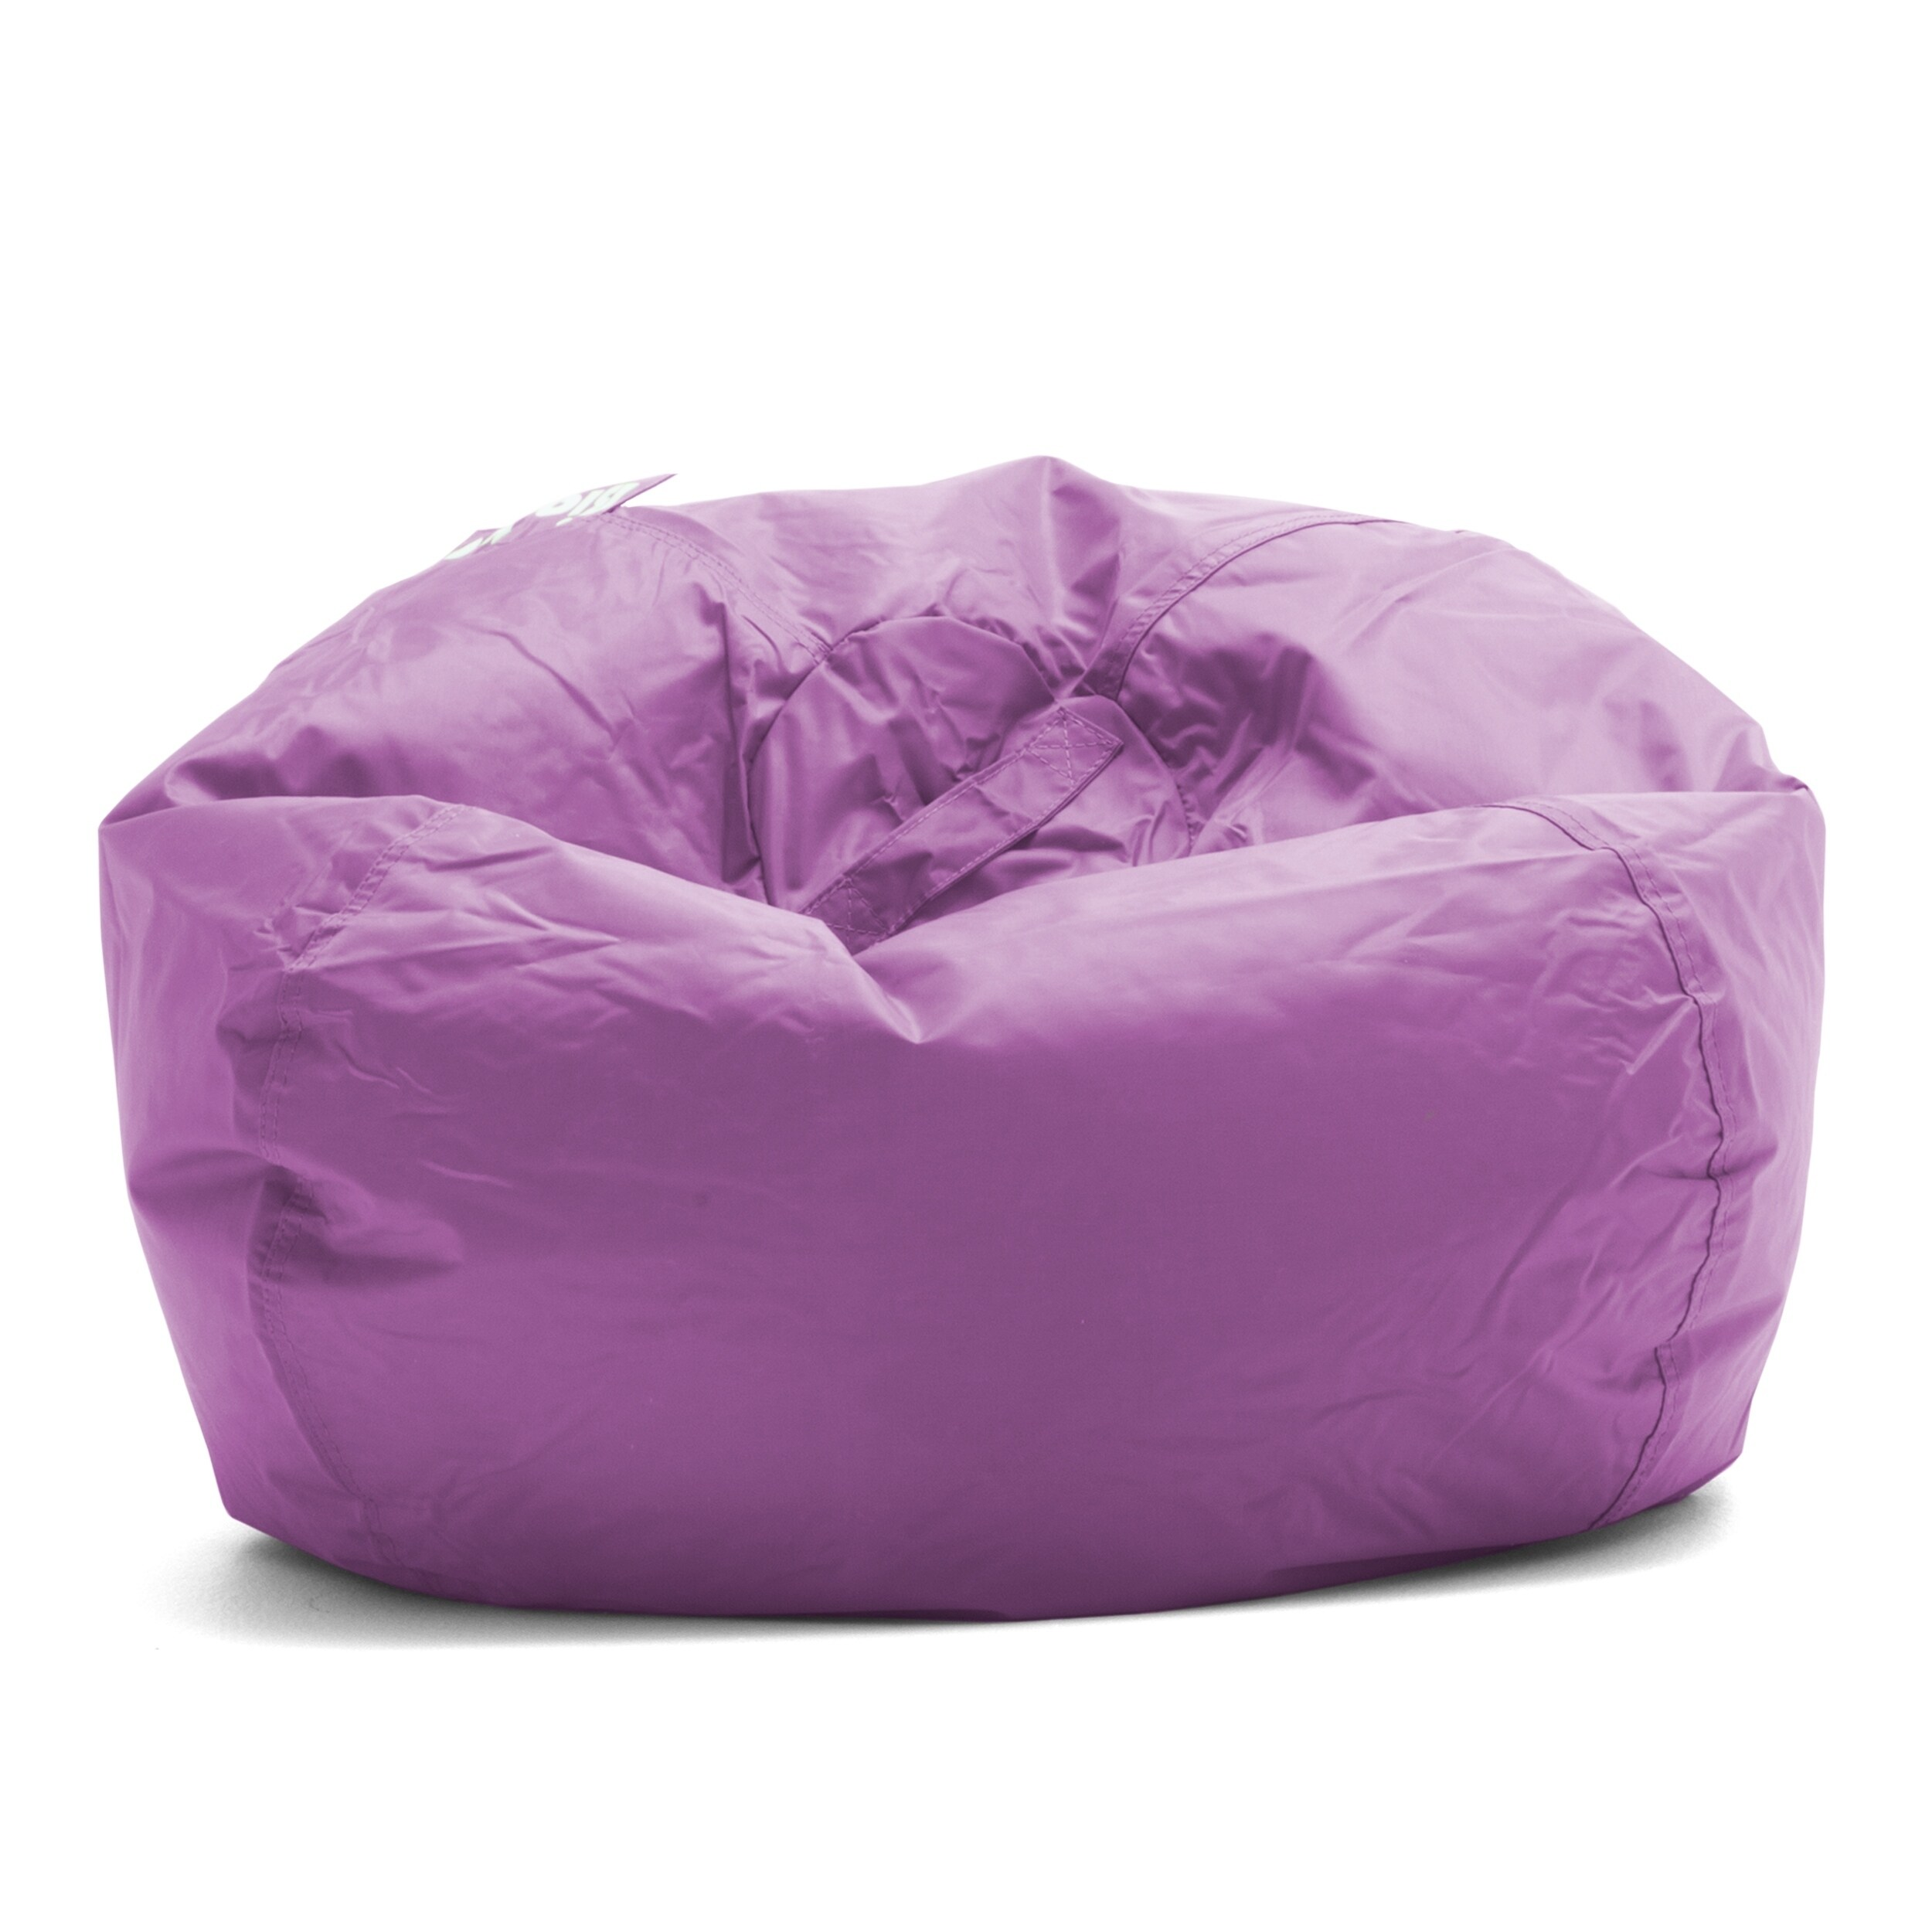 Sensational Big Joe Kids Classic 98 Bean Bag Chair Machost Co Dining Chair Design Ideas Machostcouk